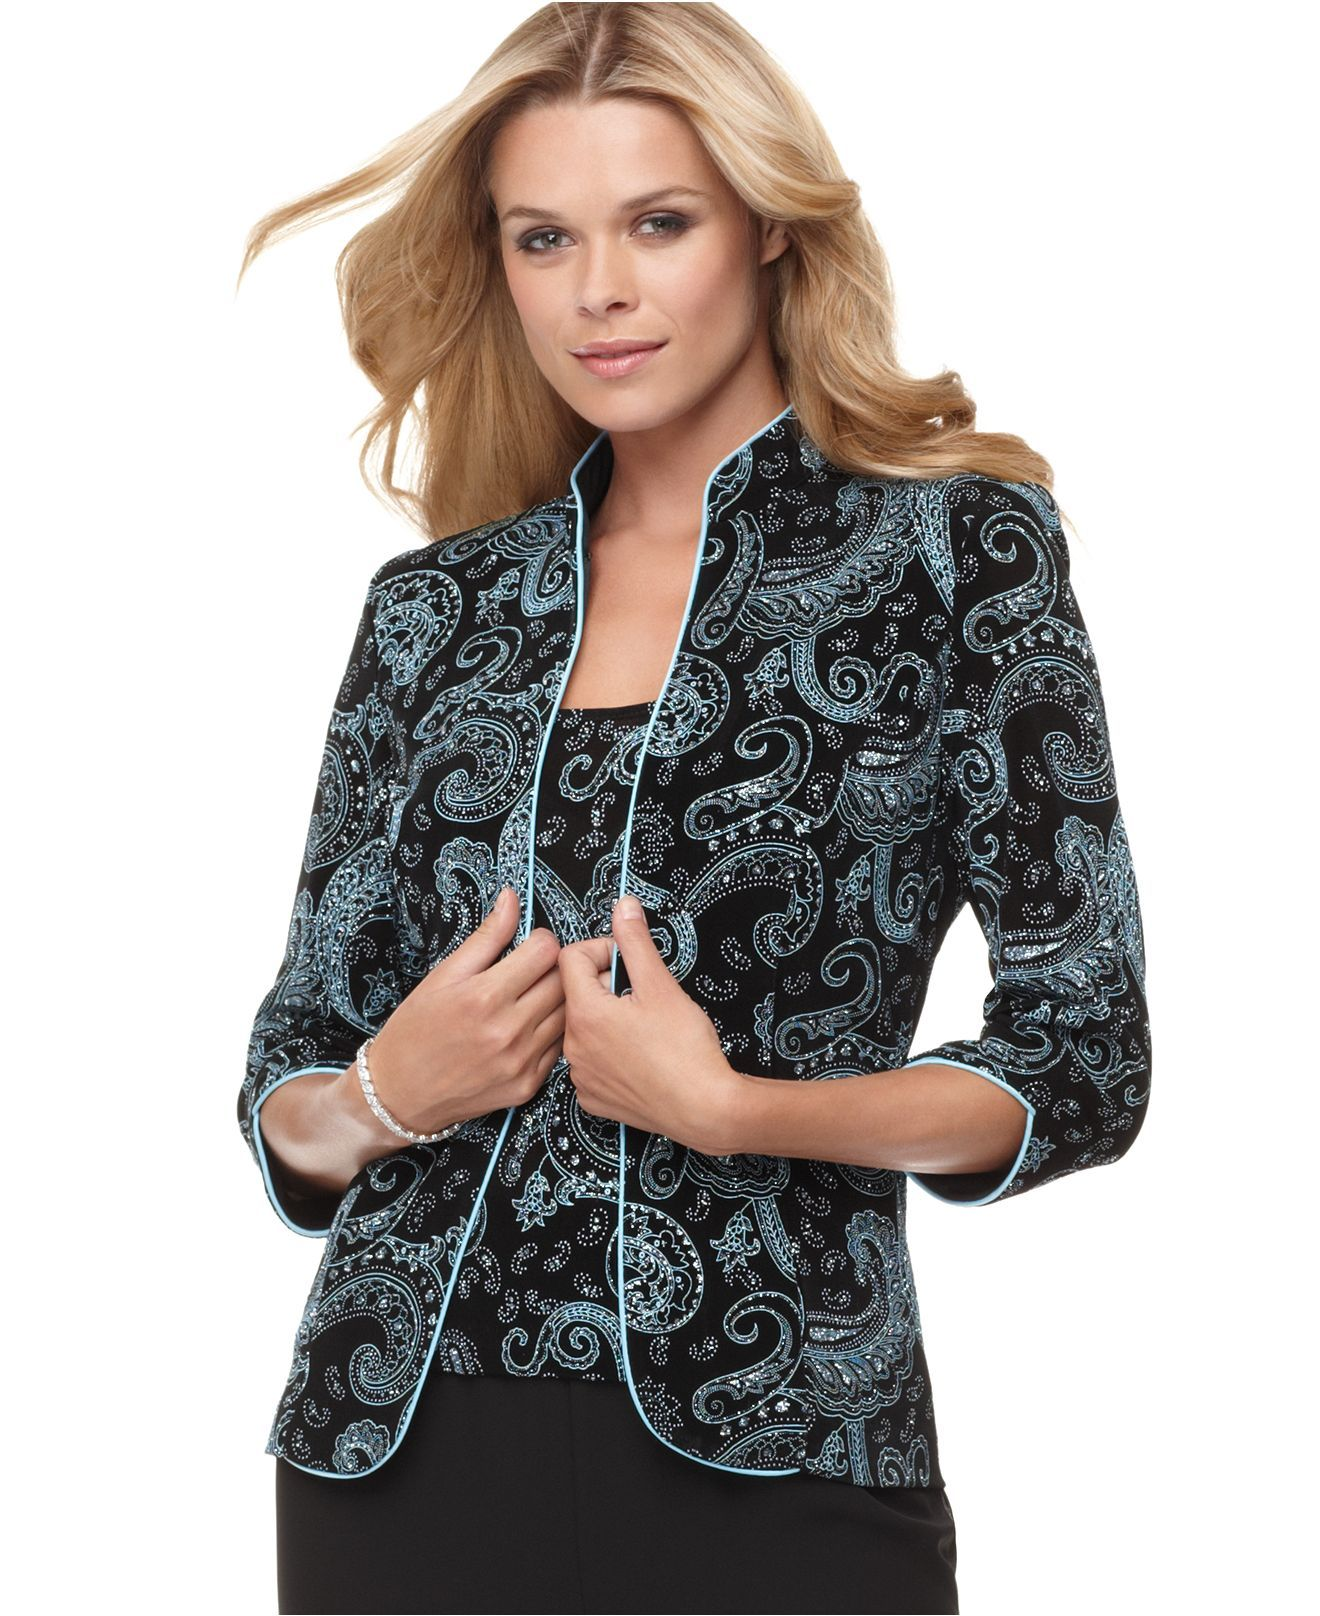 483971317b623 Alex Evenings Three-Quarter-Sleeve Metallic Paisley Jacket and Shell -  Jackets   Blazers - Women - Macy s